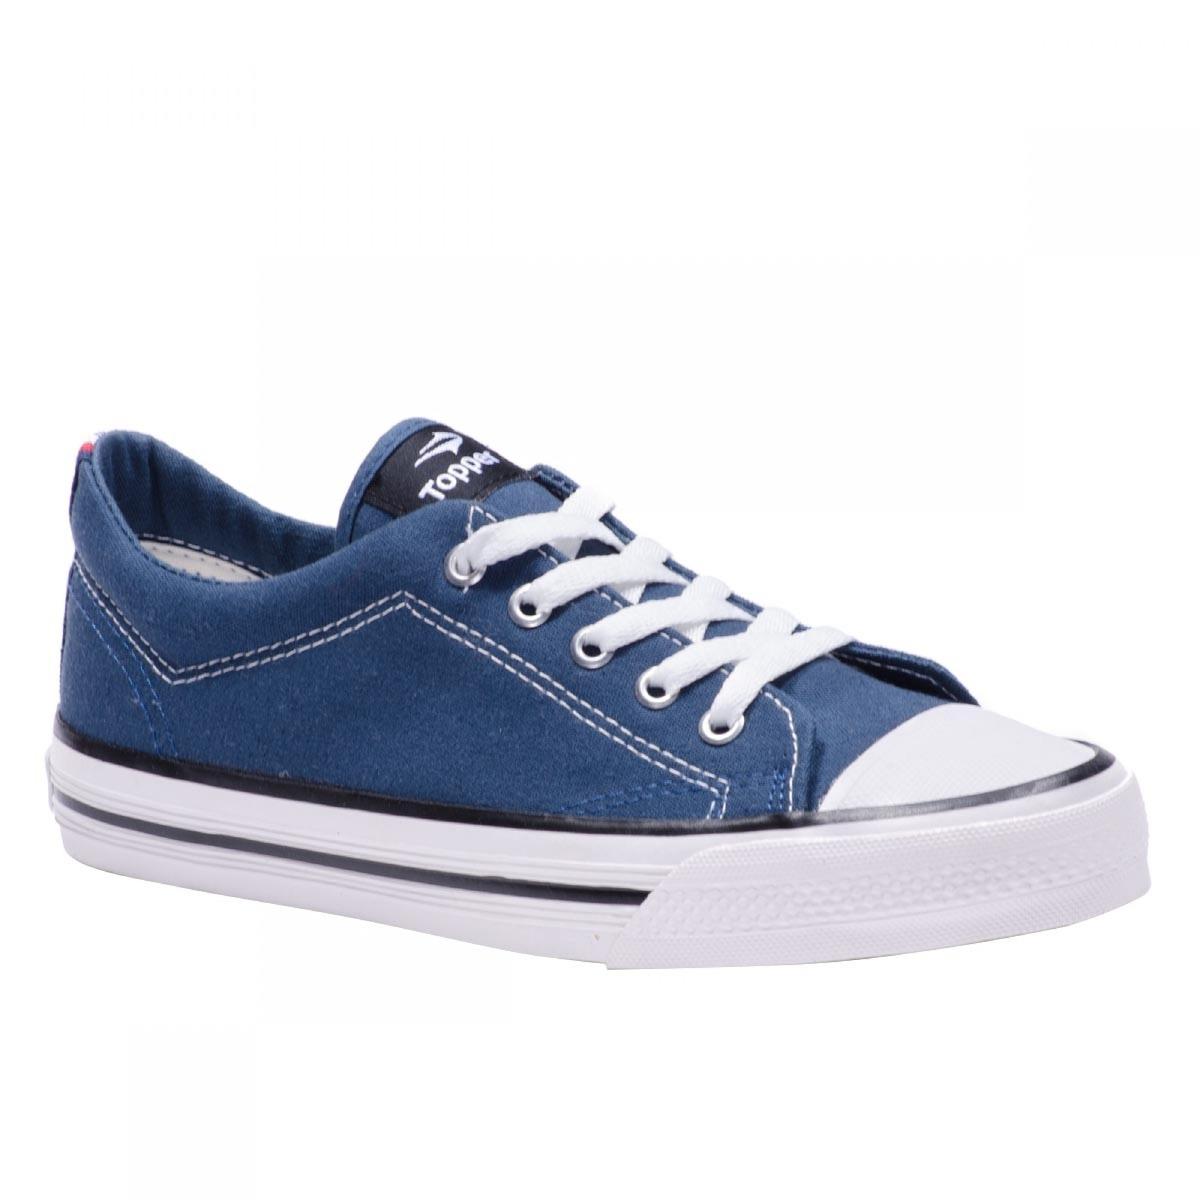 68fea27257e zapatilla topper derby 89716 azul insignia. Cargando zoom.